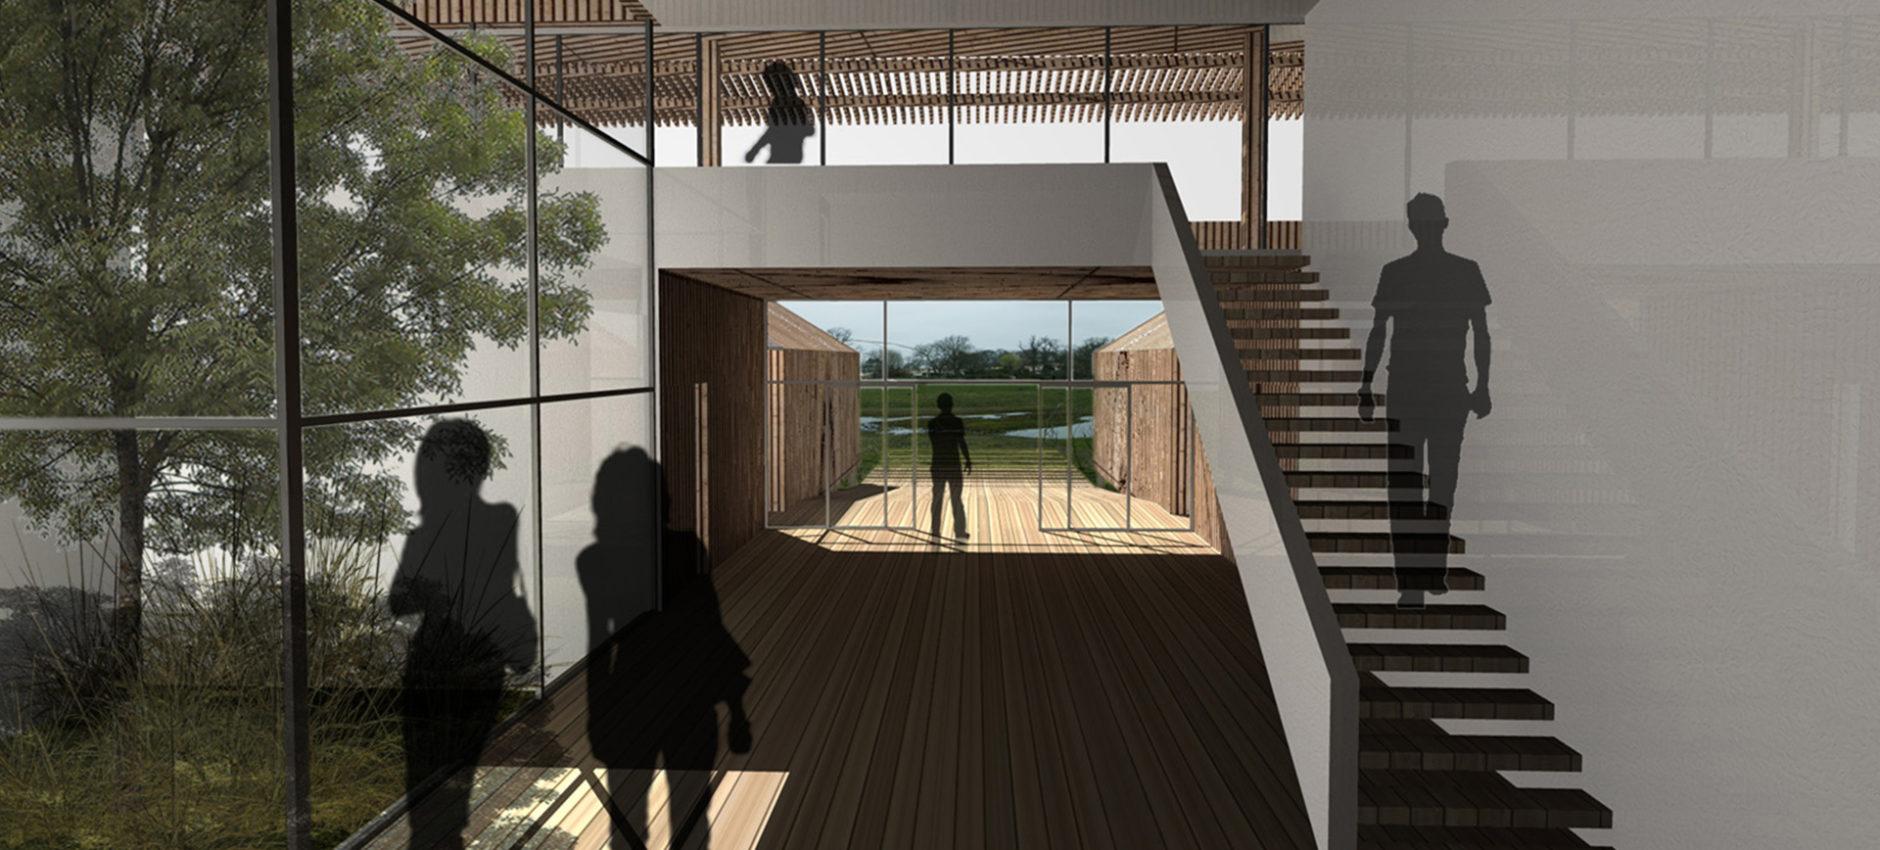 boca_architecture_projet_centre_thalasso_lanton_04.jpg